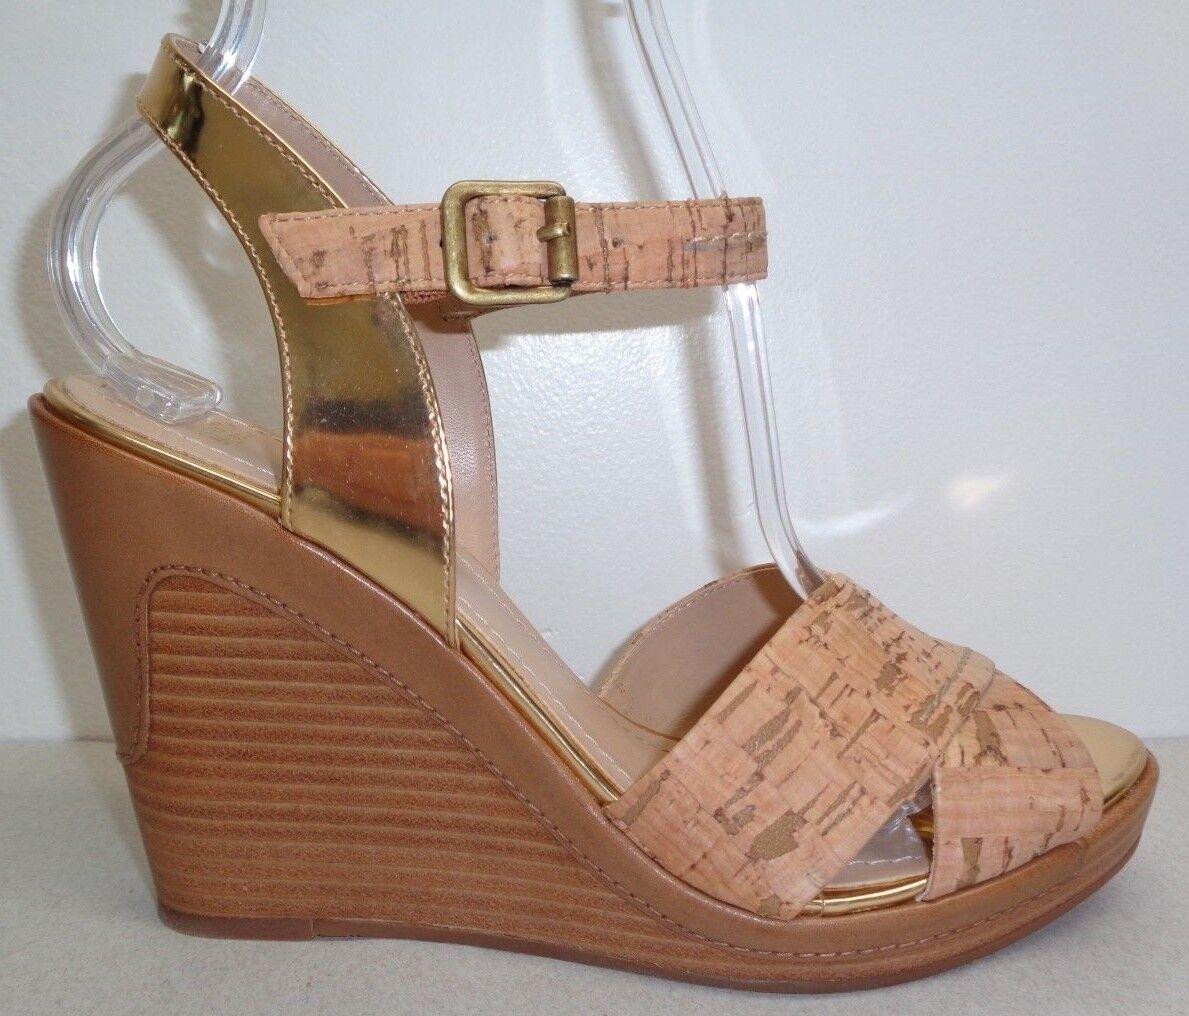 Johnston & Murphy Size Cork 10 M MAREN Gold Cork Size Leather Sandals New Womens Shoes 6968b6